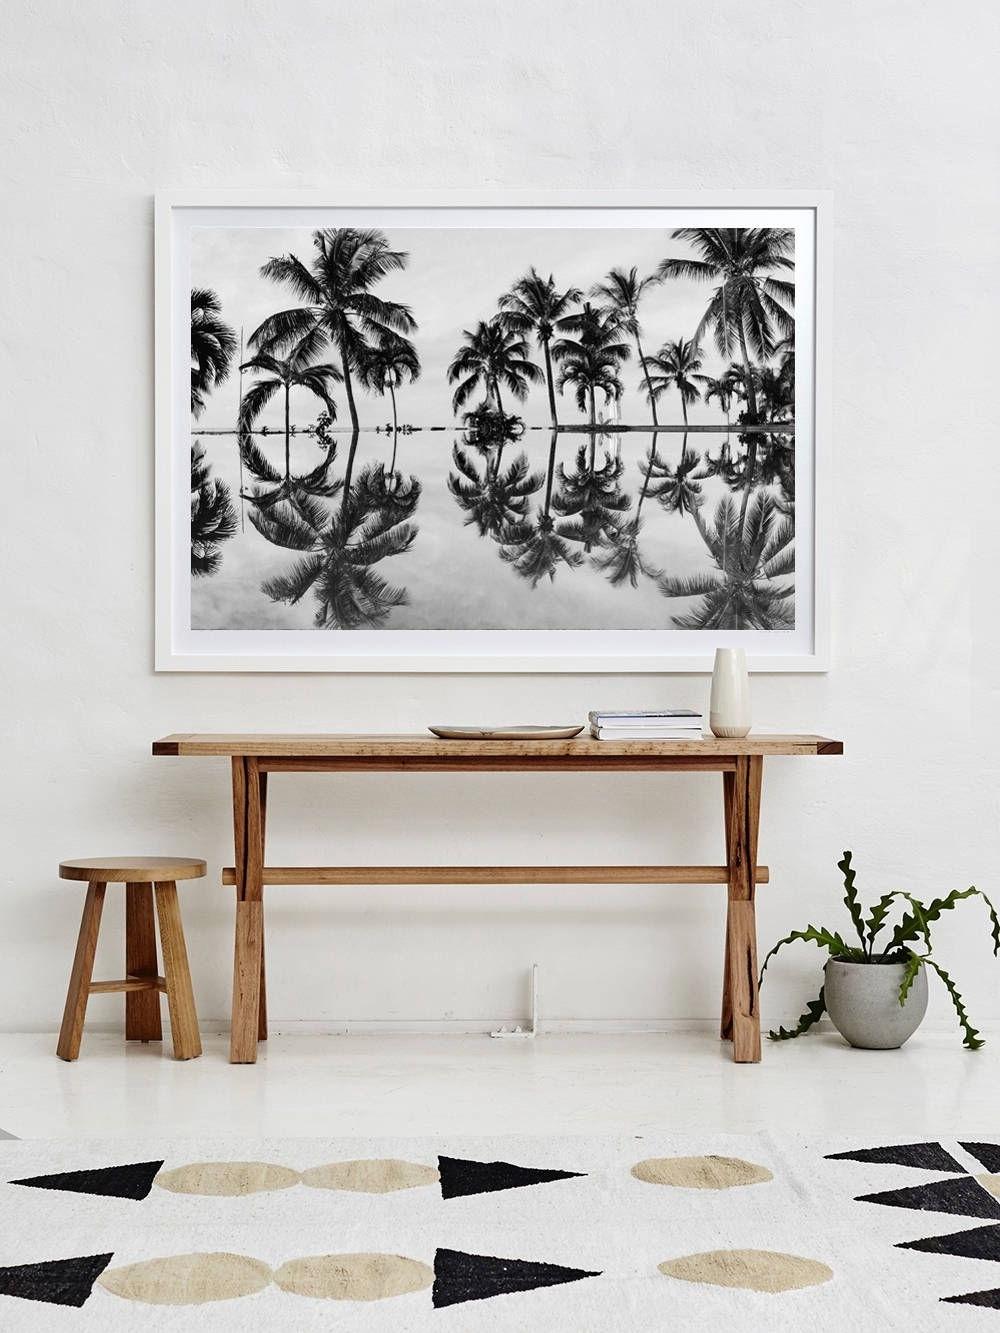 Coastal Wall Art Throughout 2017 Black And White Print, Coastal Decor Print, Tropical Print (View 7 of 15)